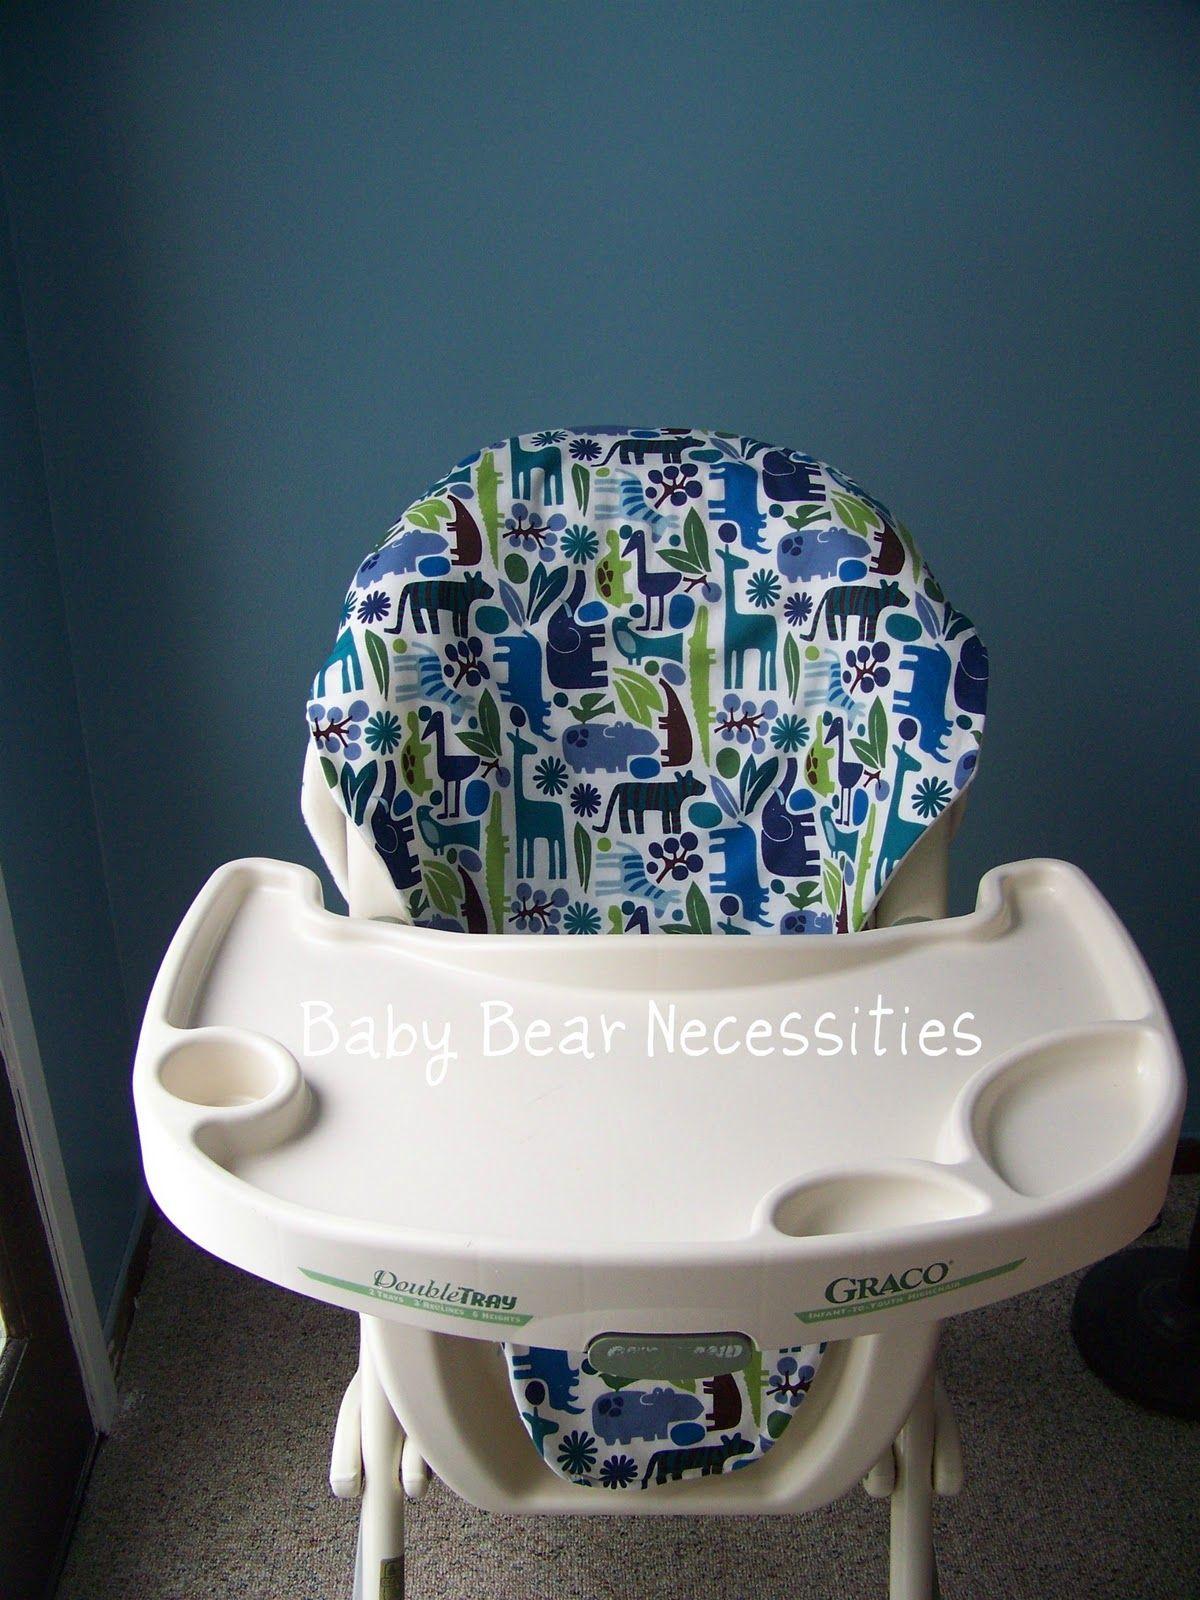 Baby Bear Necessities High Chair Cover Tutorial DIY